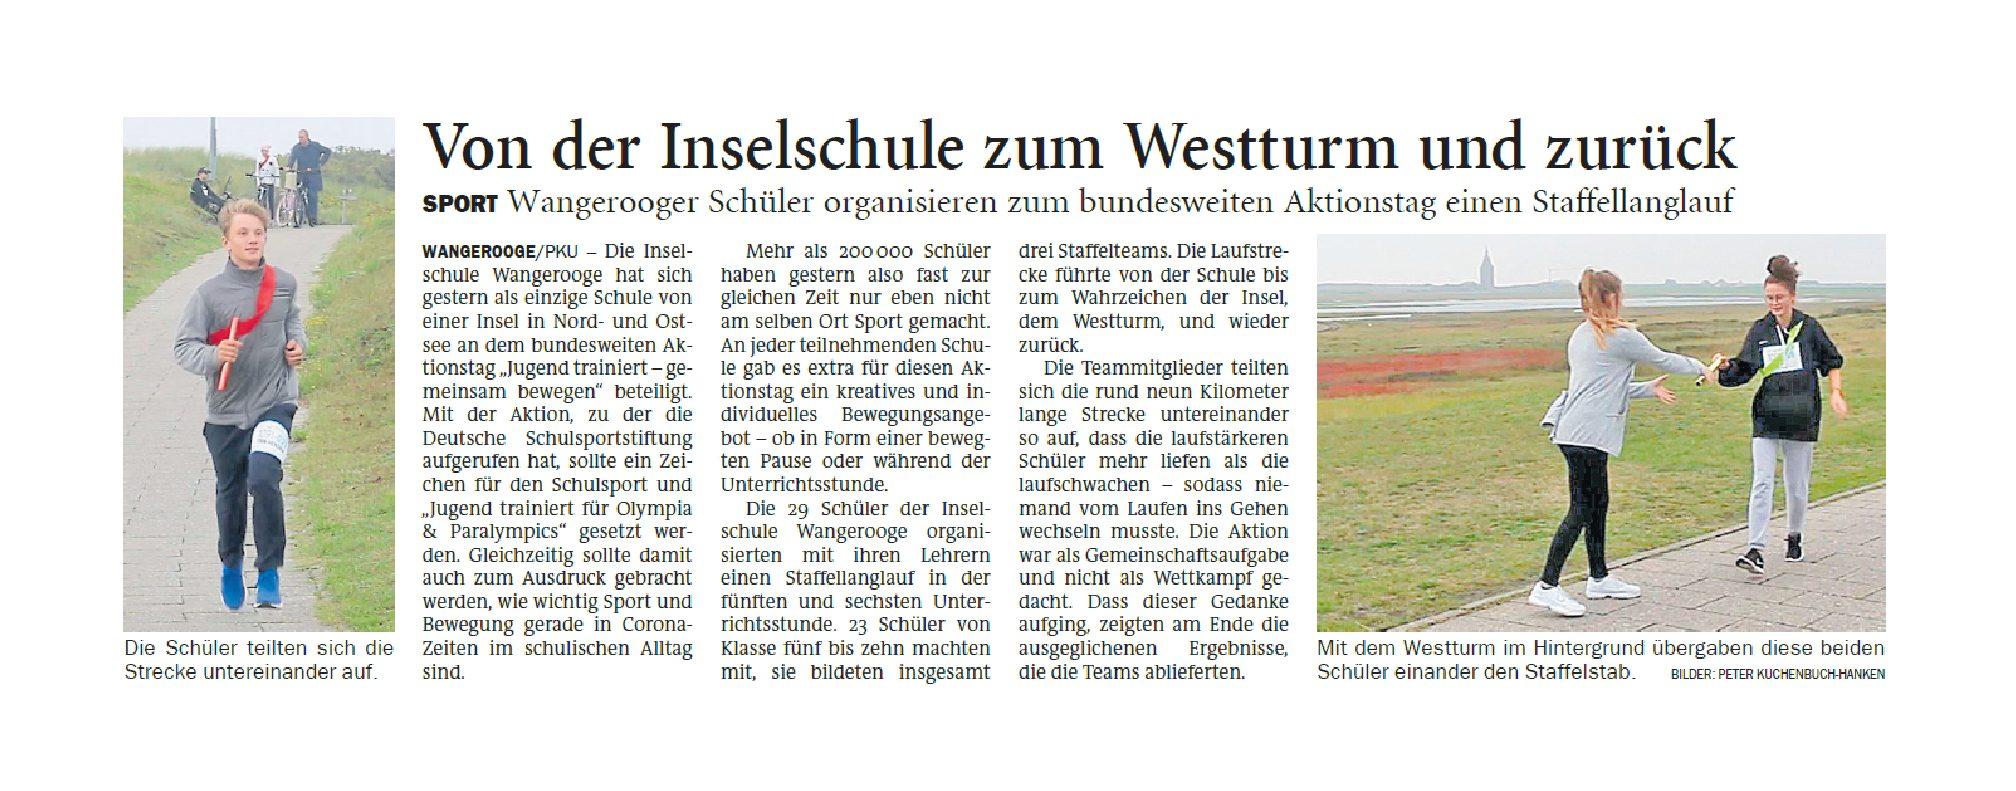 Jeversches Wochenblatt 01.10.2020 III